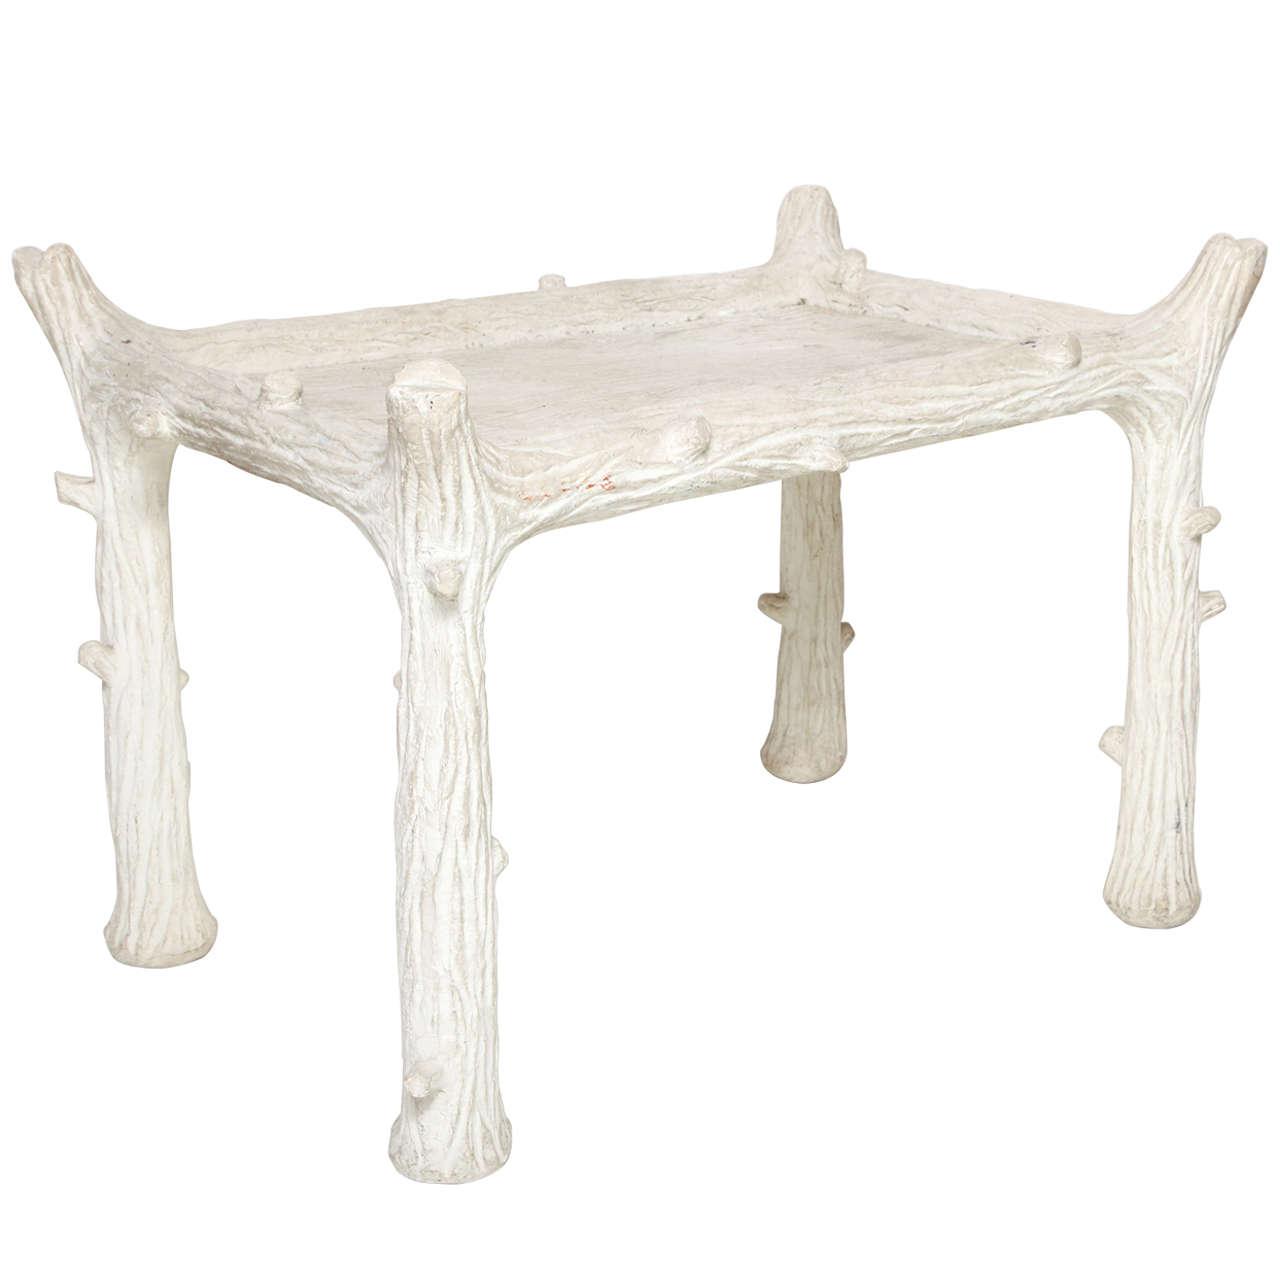 John Dickinson Plaster Twig Table